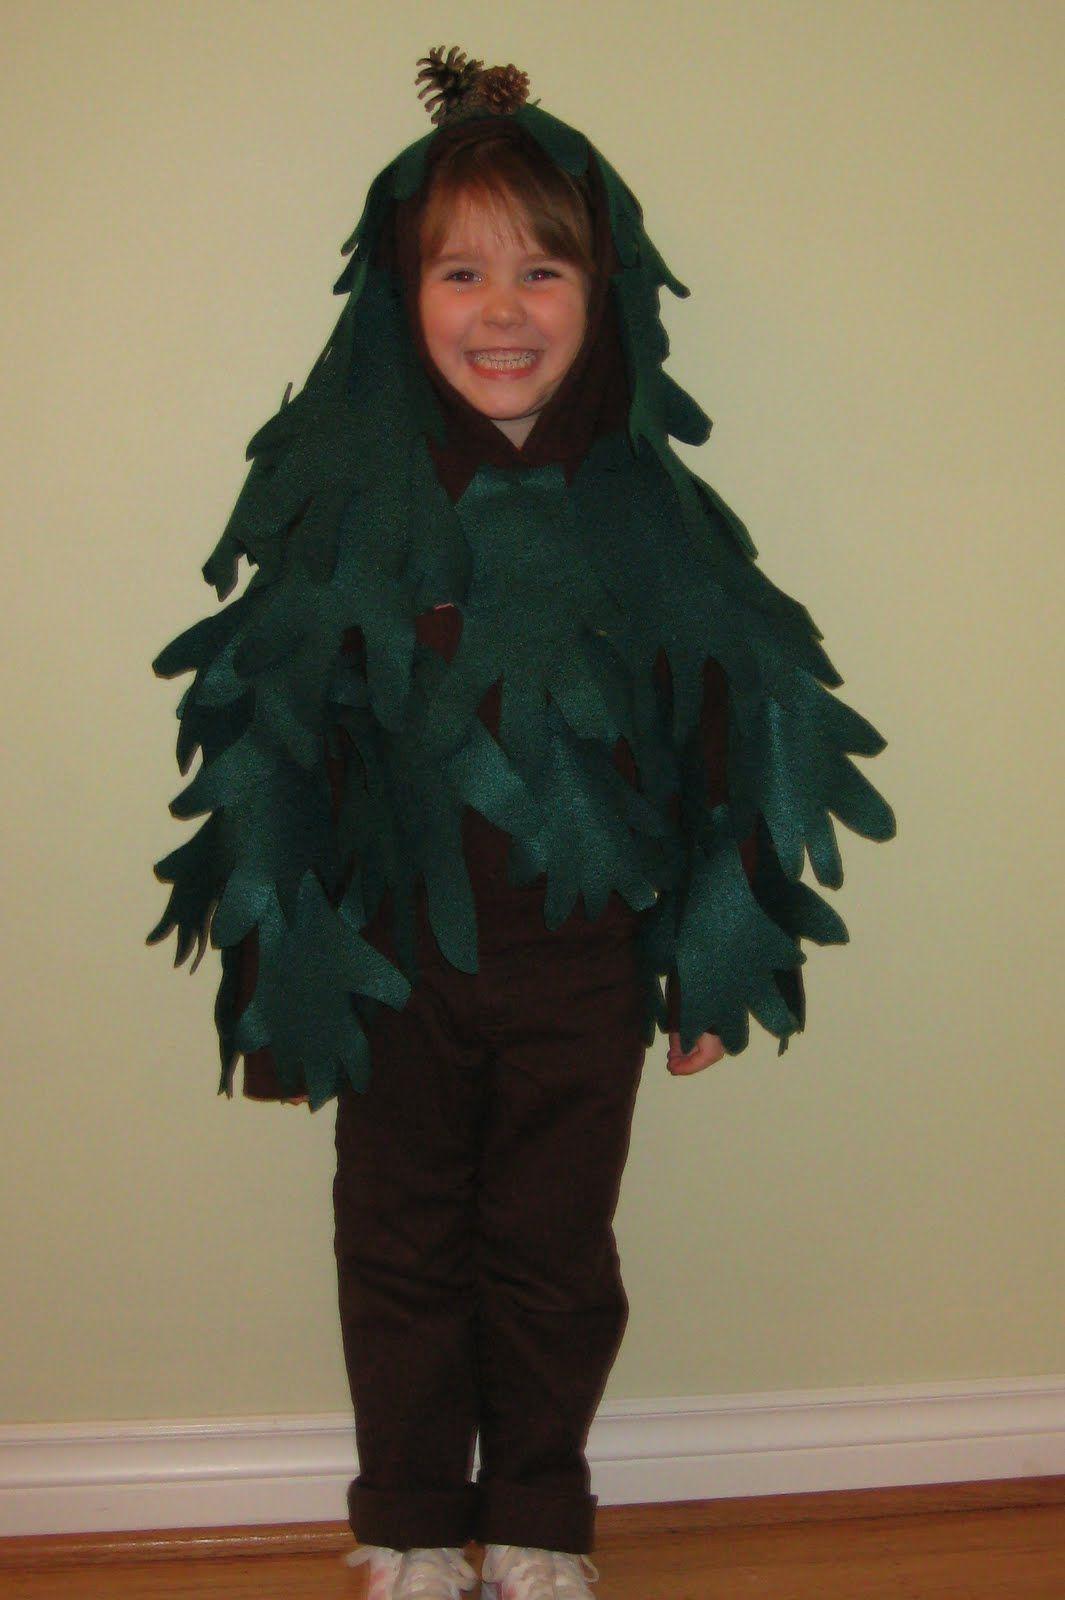 Tree Costumes Plays Catherine' World Halloween